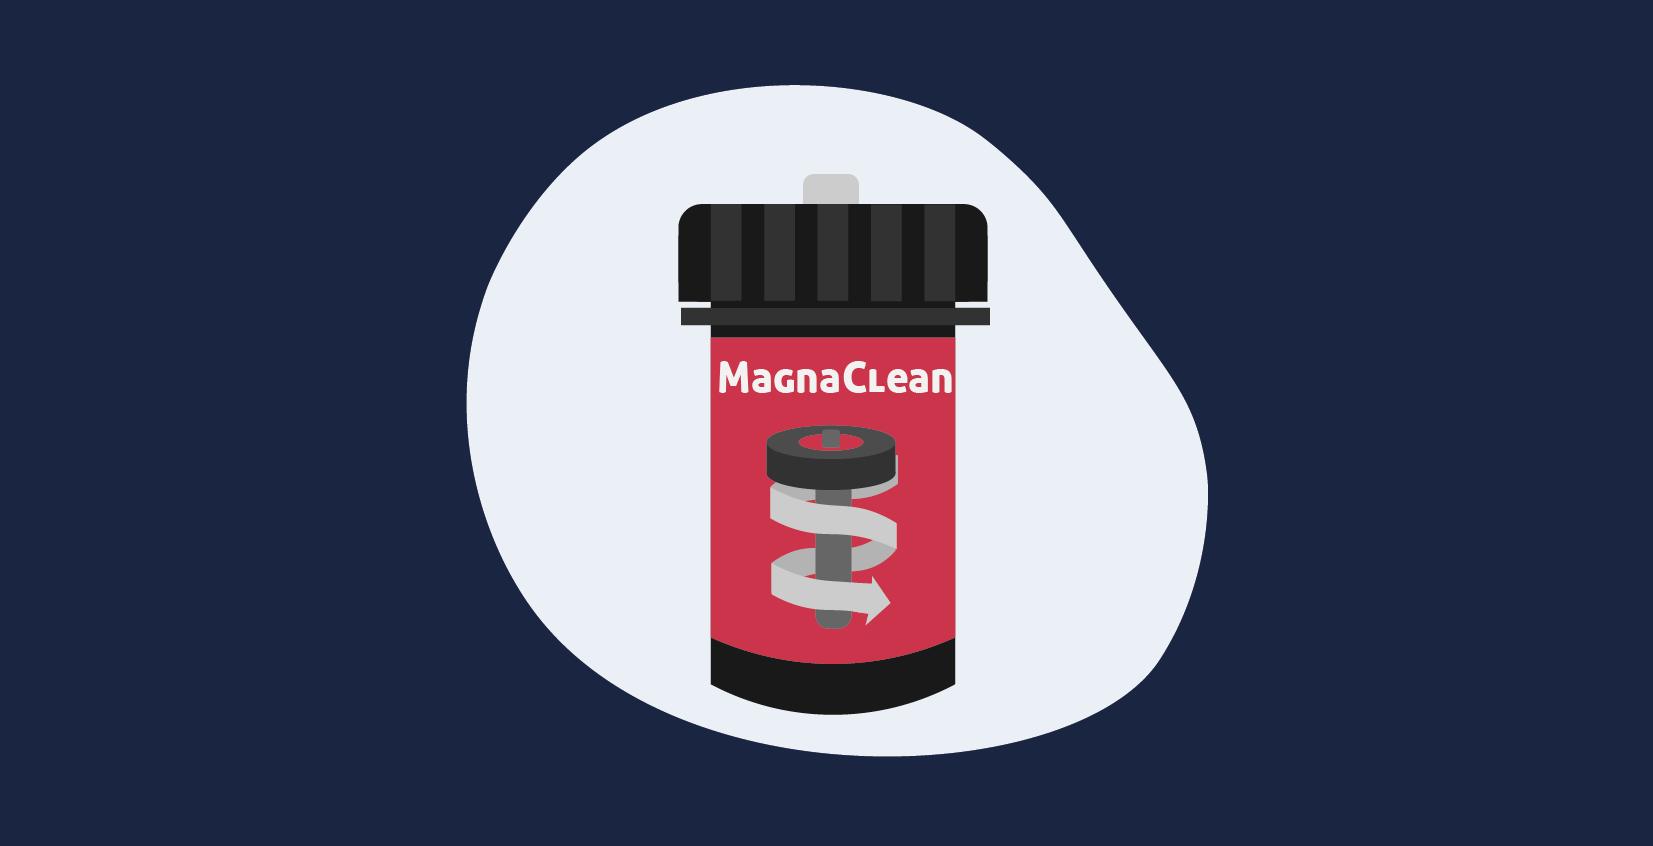 What Is A MagnaClean?